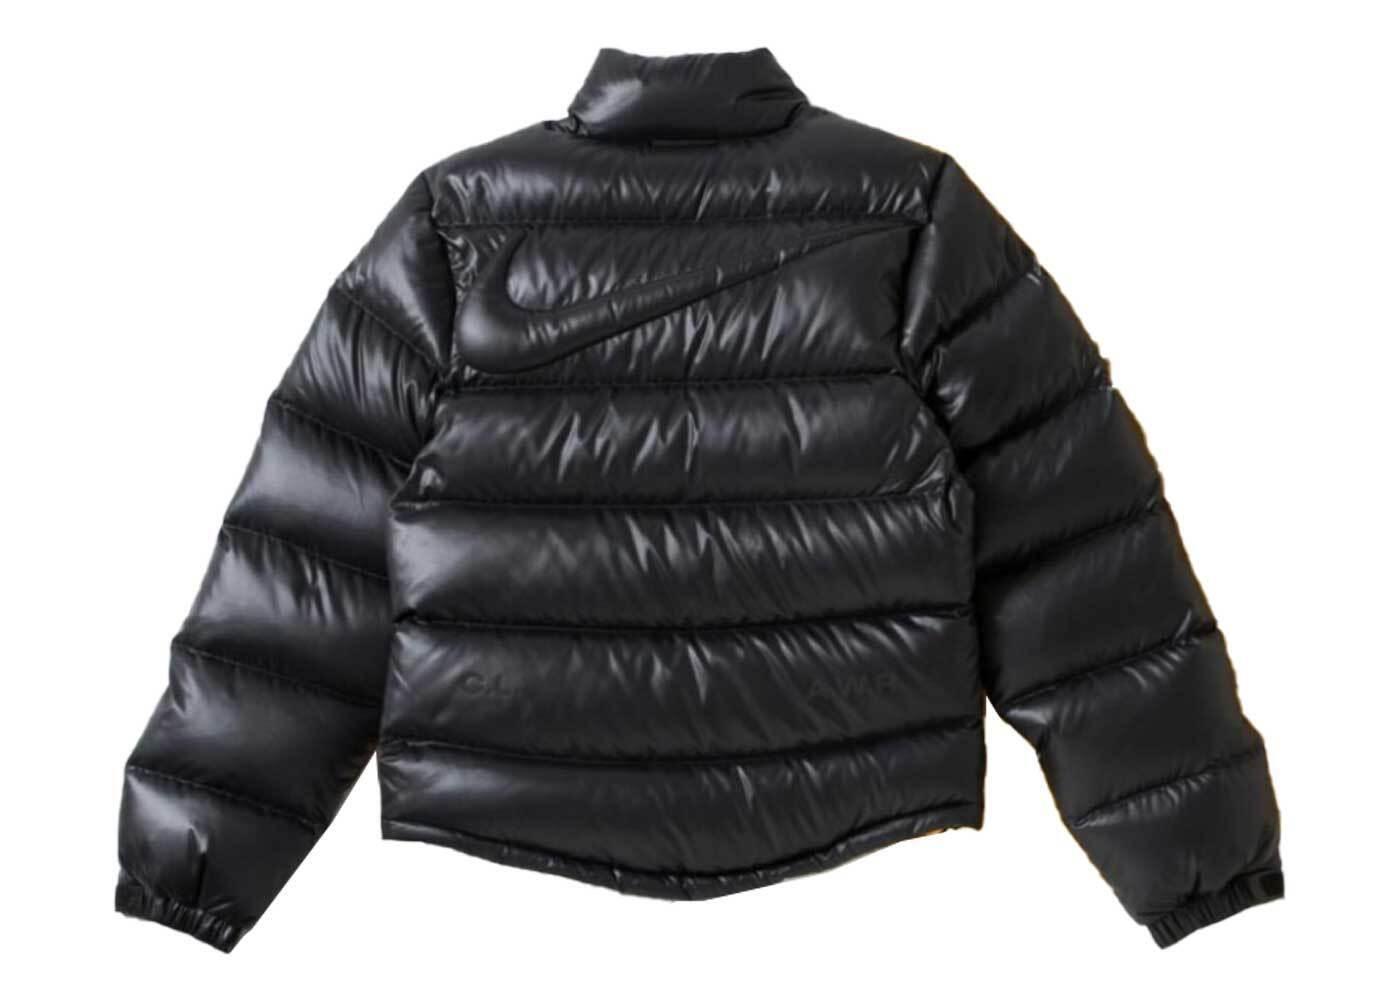 NOCTA x Nike Puffer Jacket Blackの写真